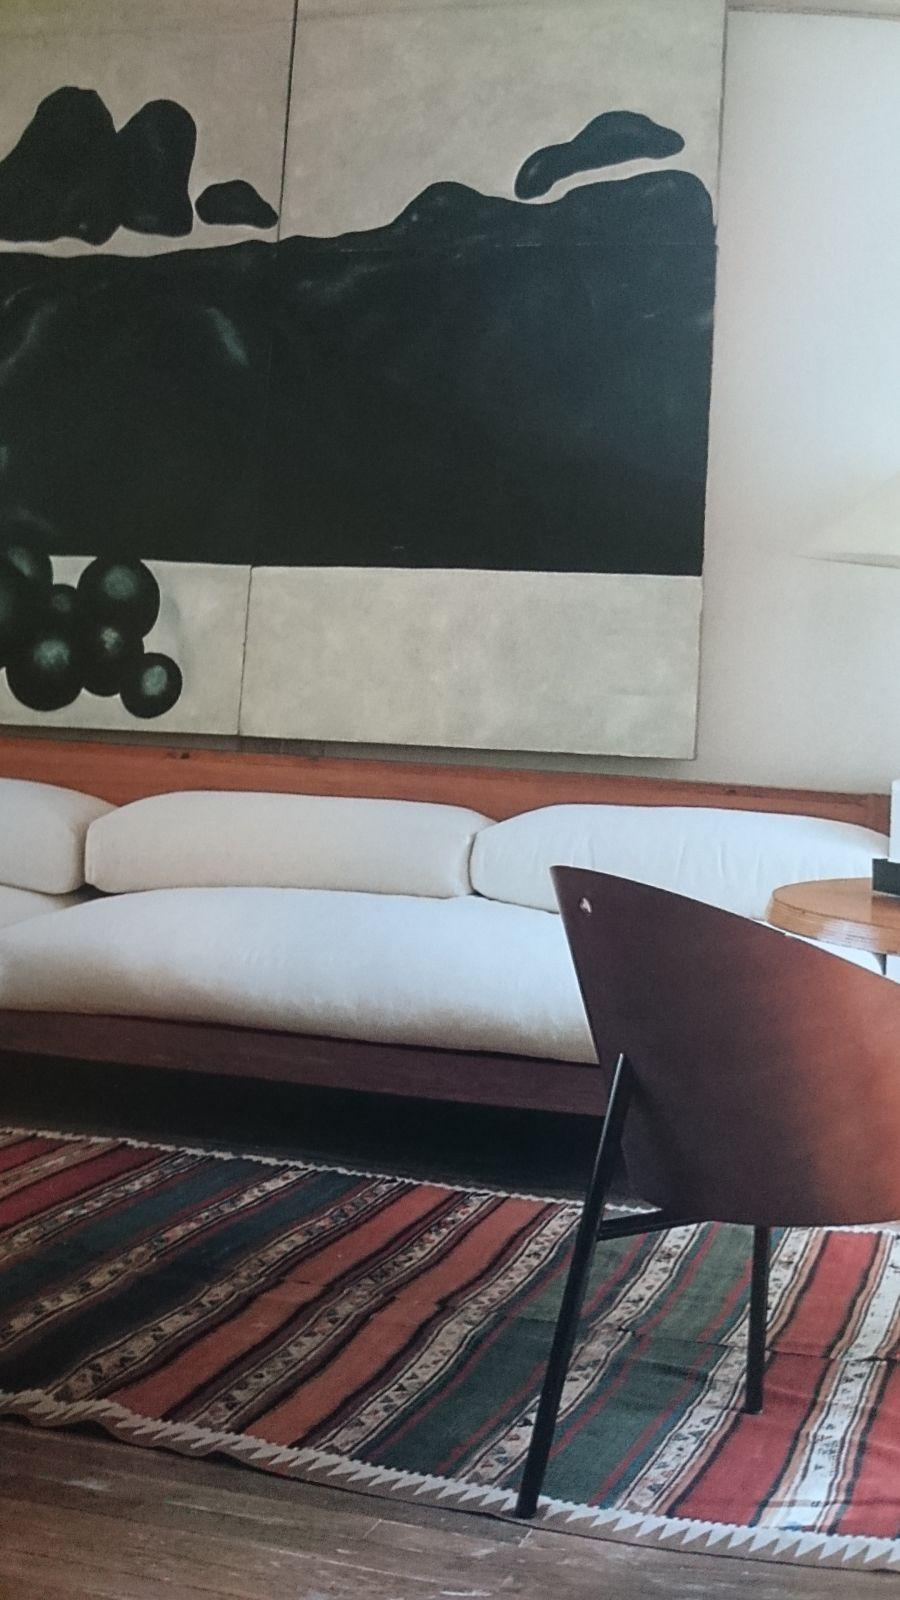 achat tapis ancien marseille achat tapis ancien nice achat tapis ancien cannes achat tapis. Black Bedroom Furniture Sets. Home Design Ideas